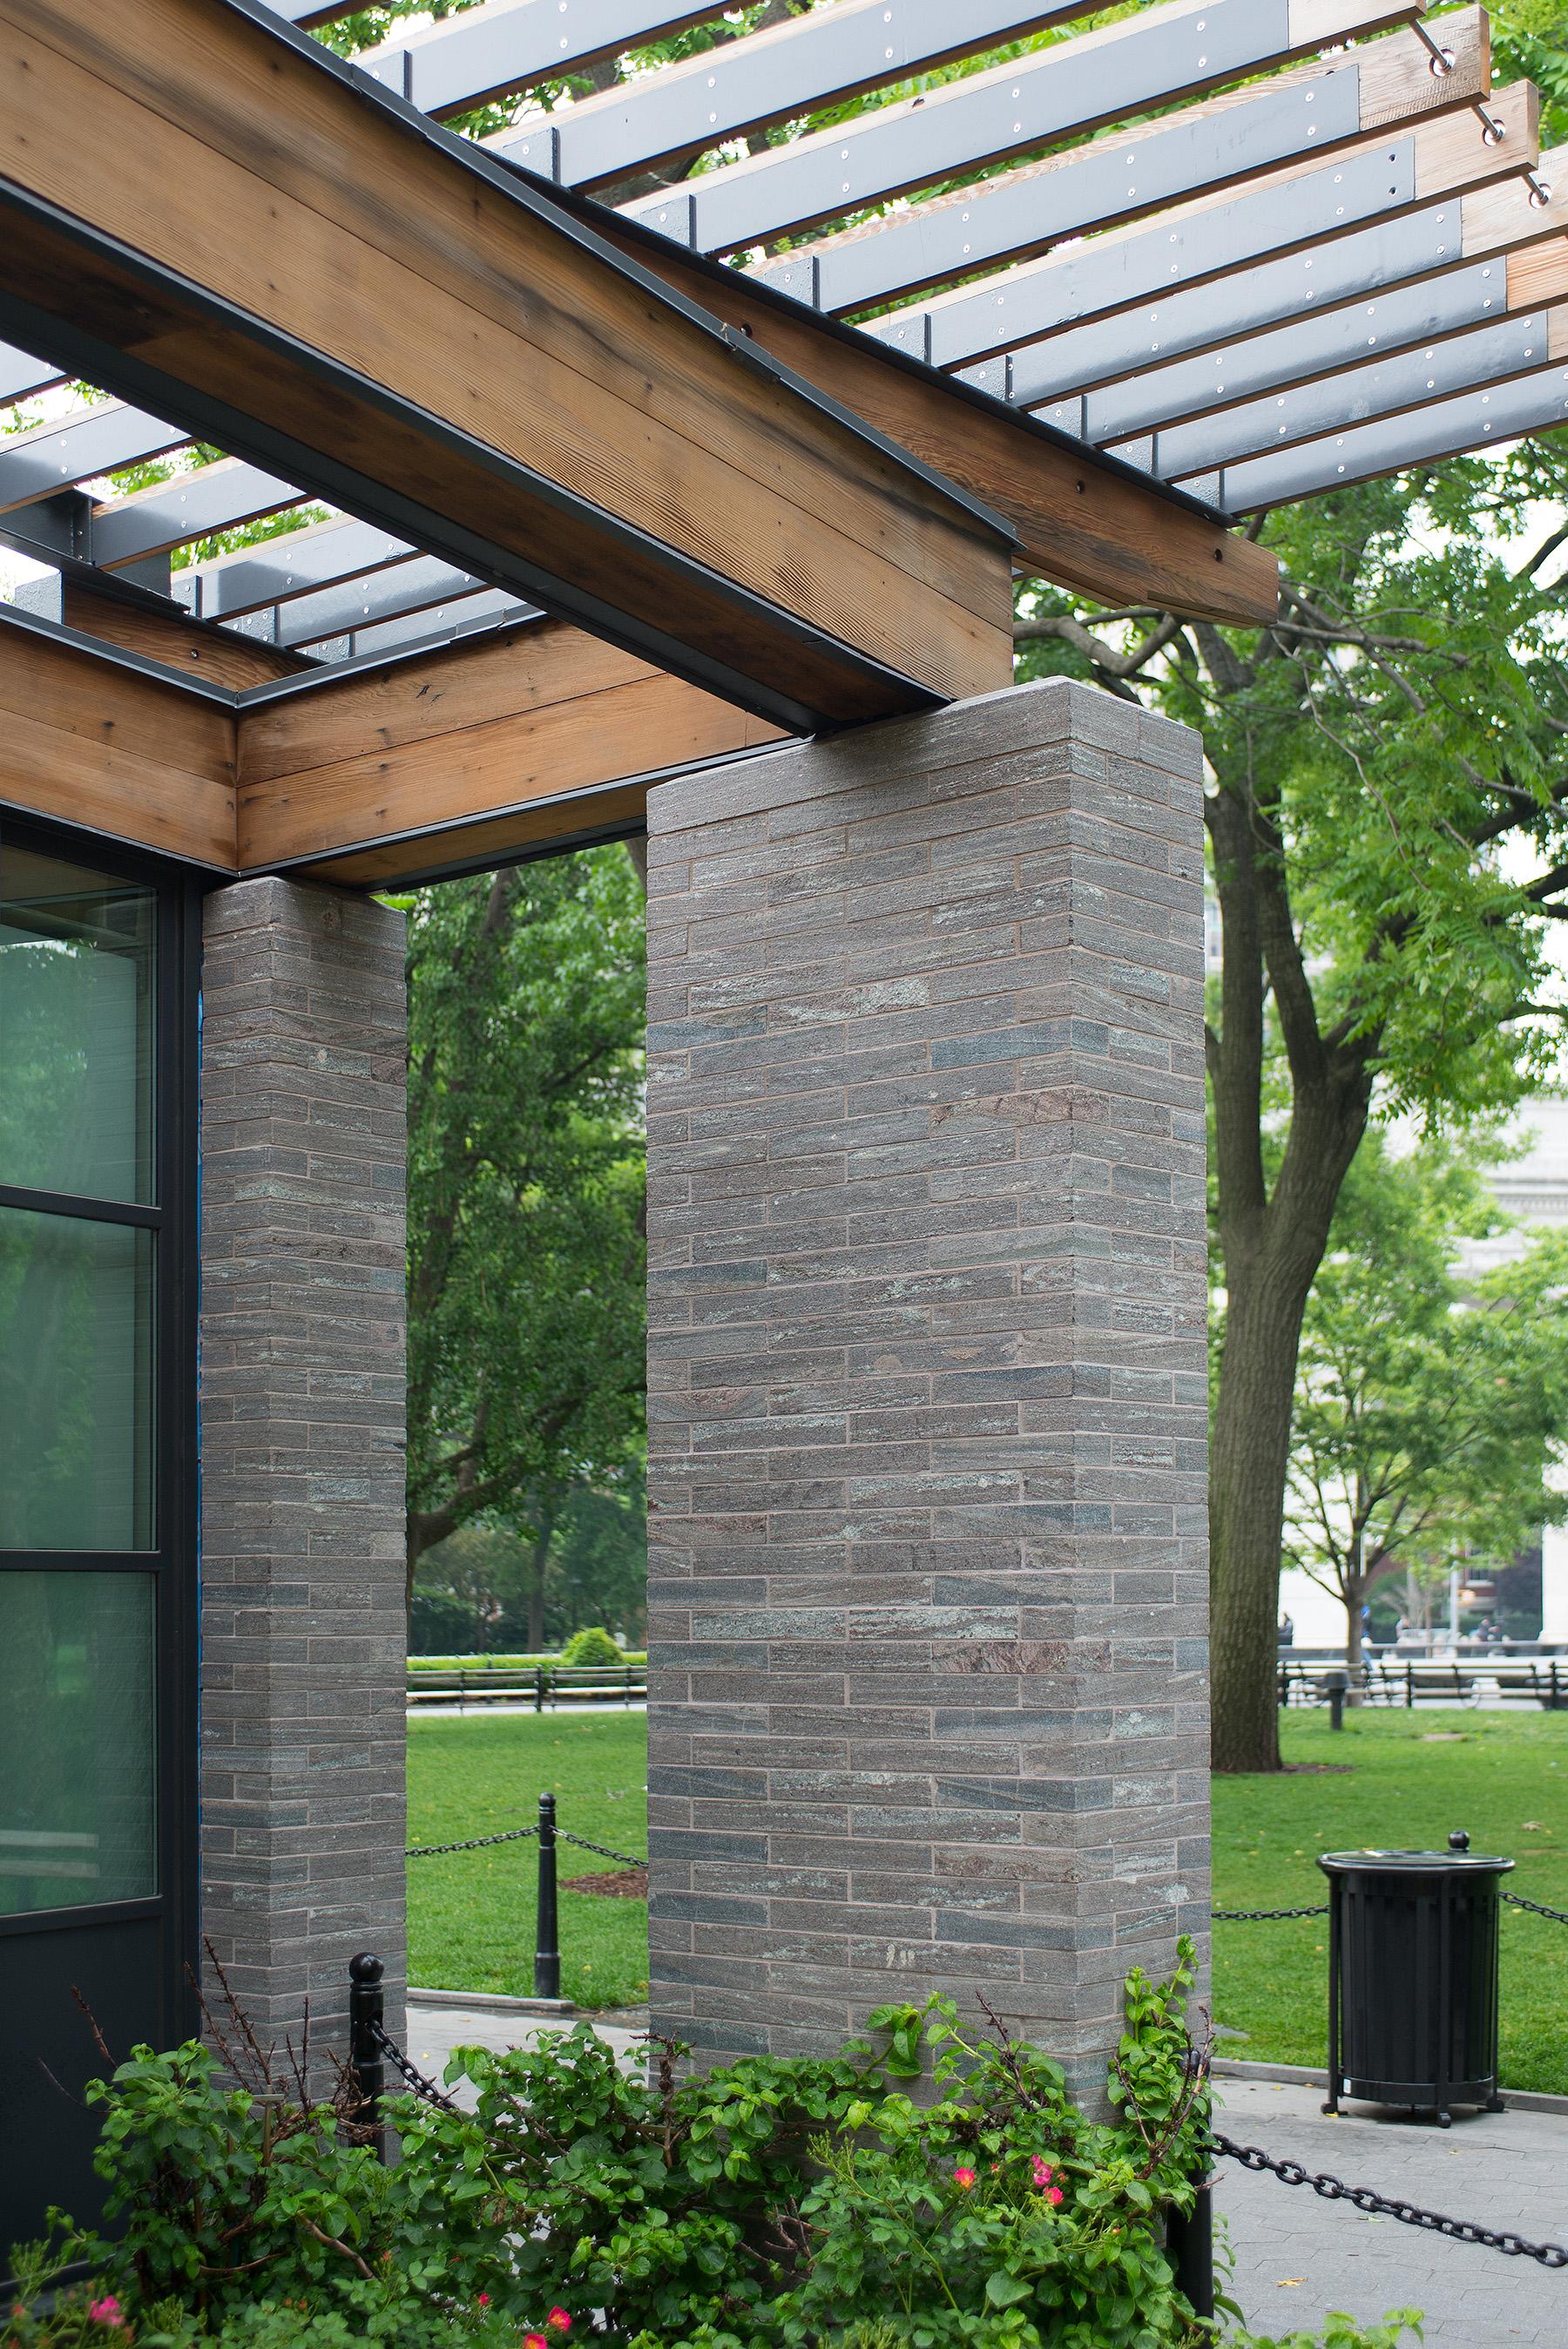 two stone pillars